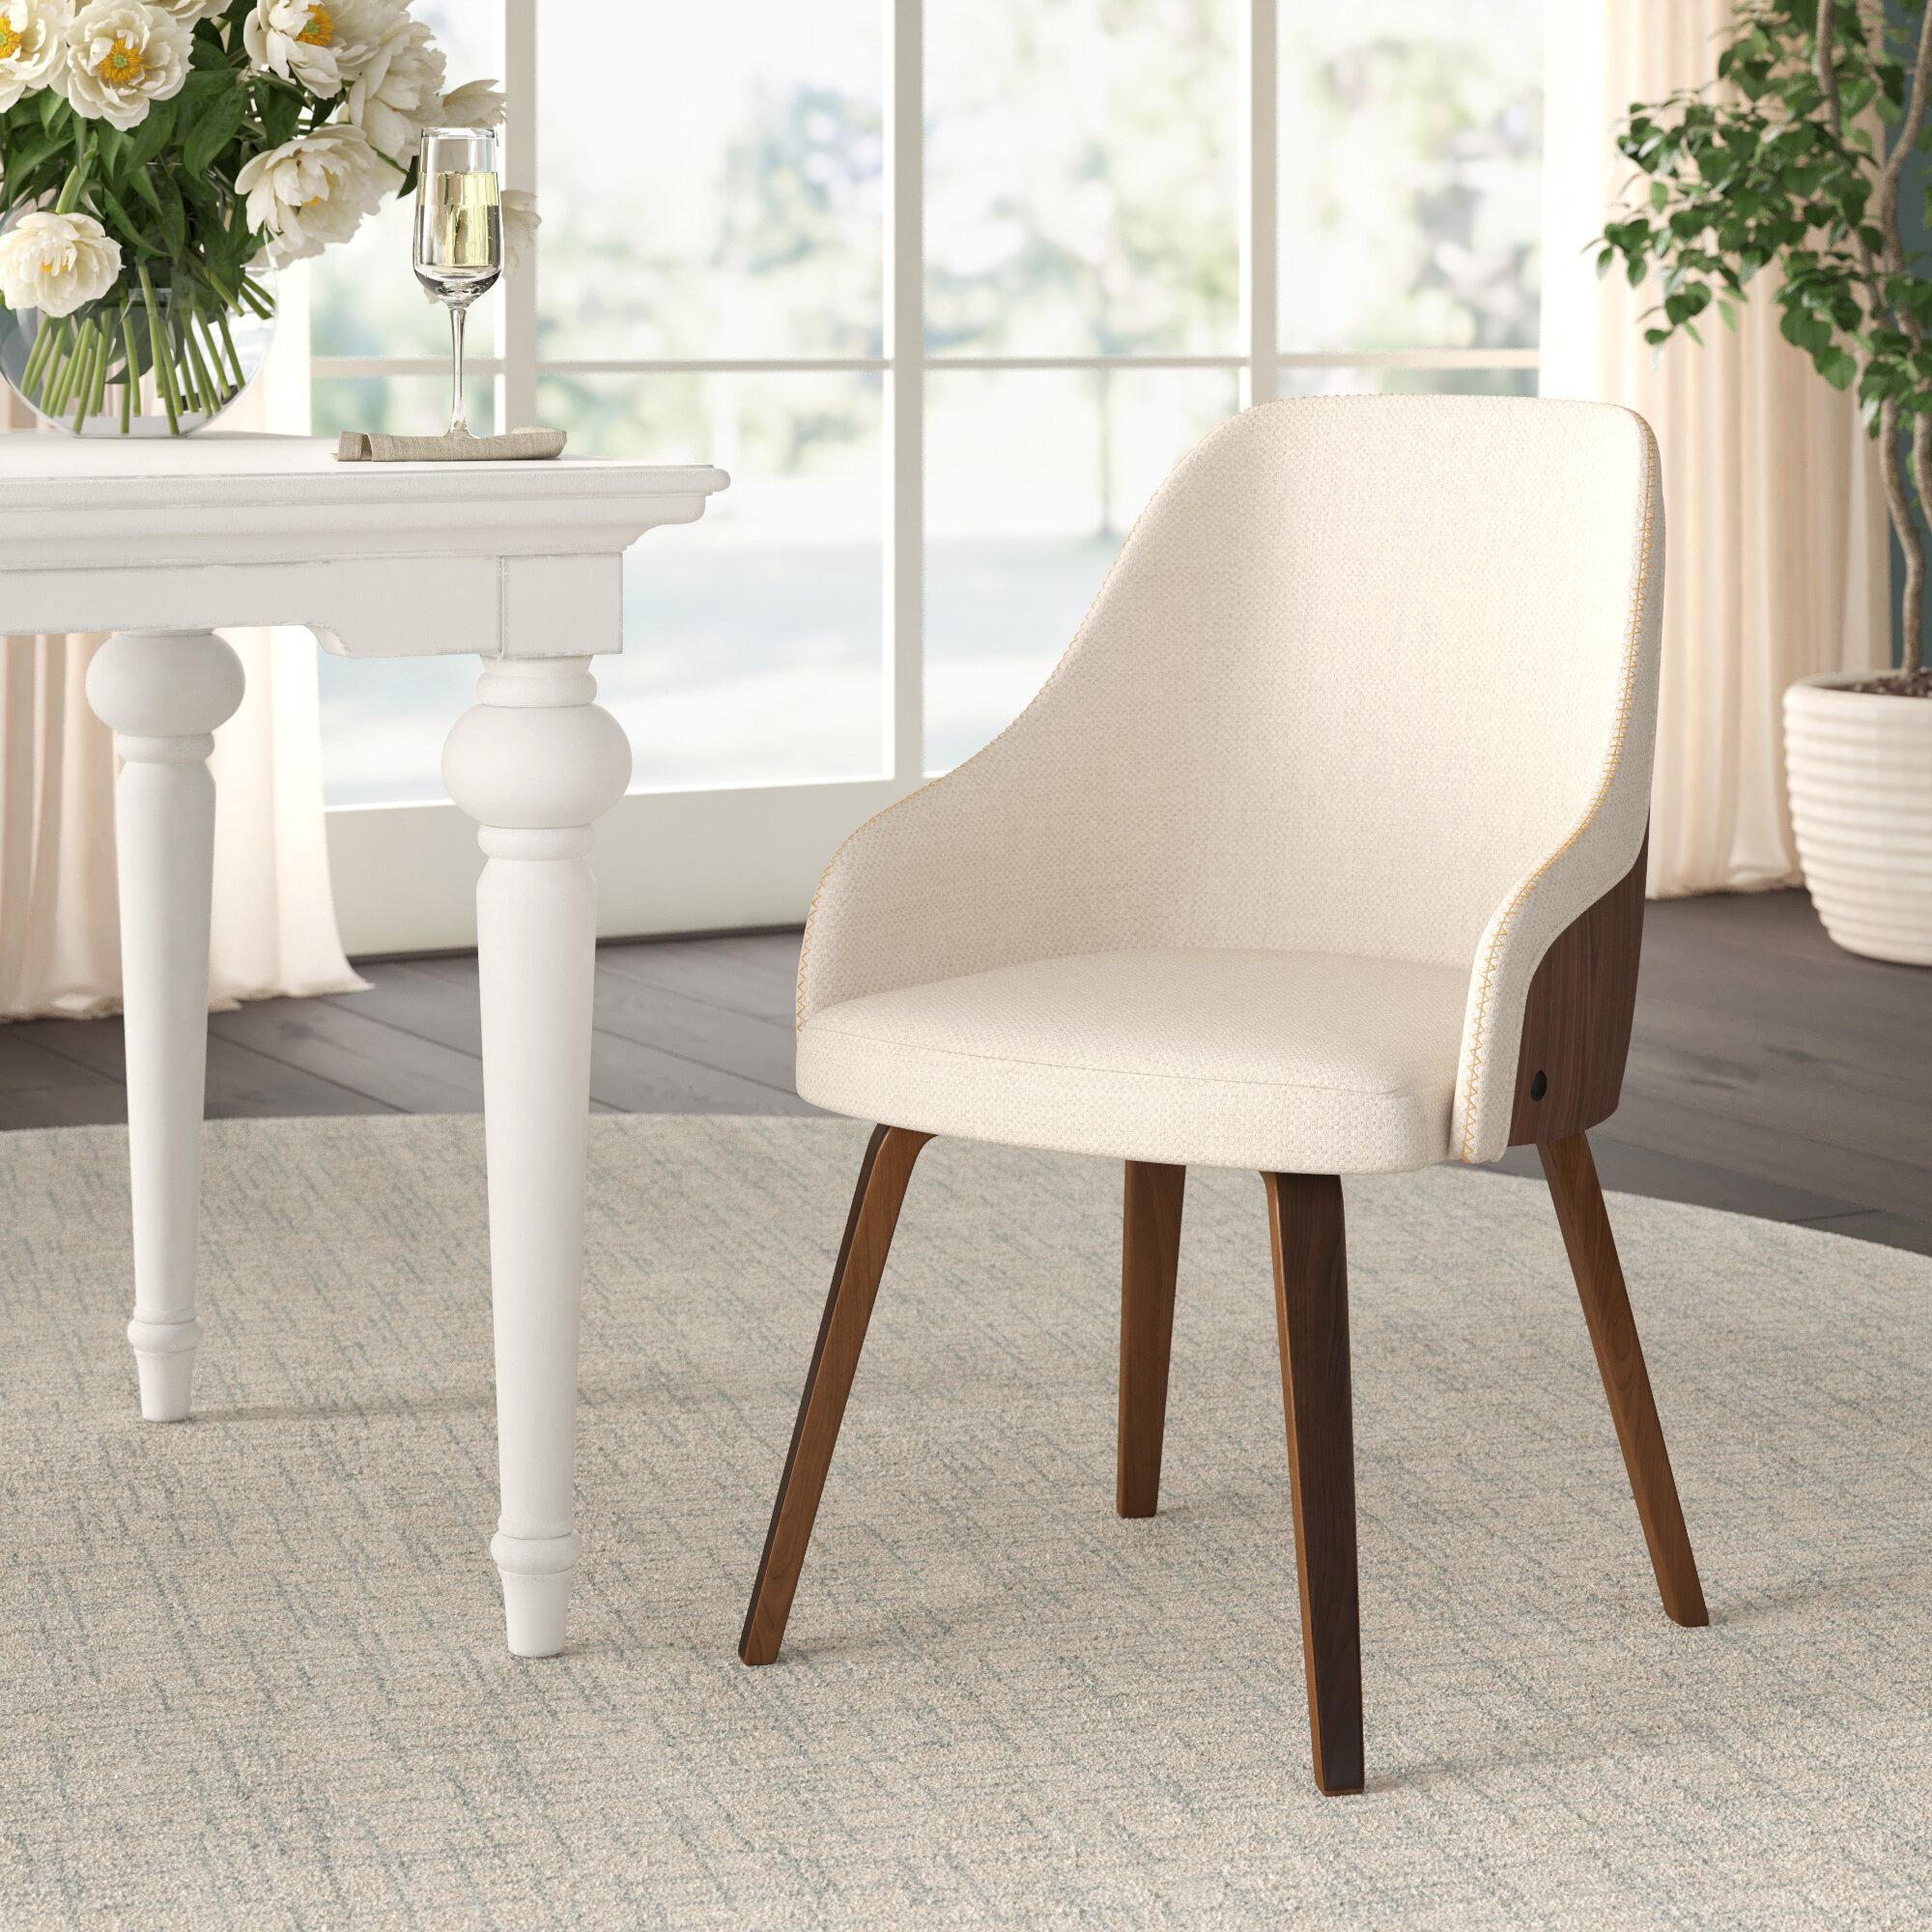 Marius Mid Century Modern Upholstered Dining Chair Reviews Joss Main